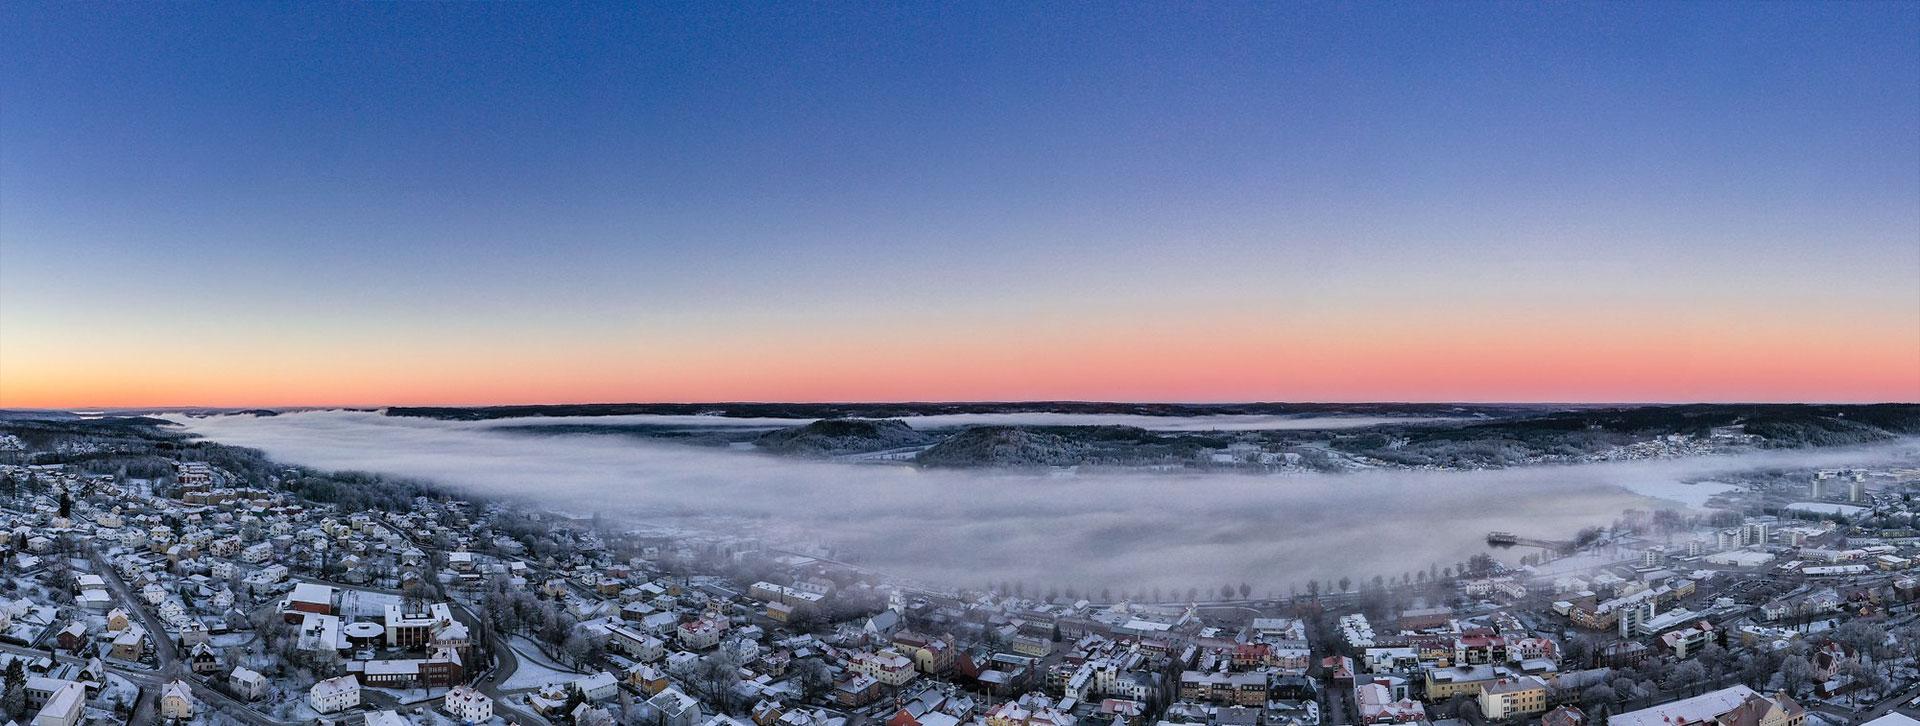 Ulricehamn i dimma, från ovan